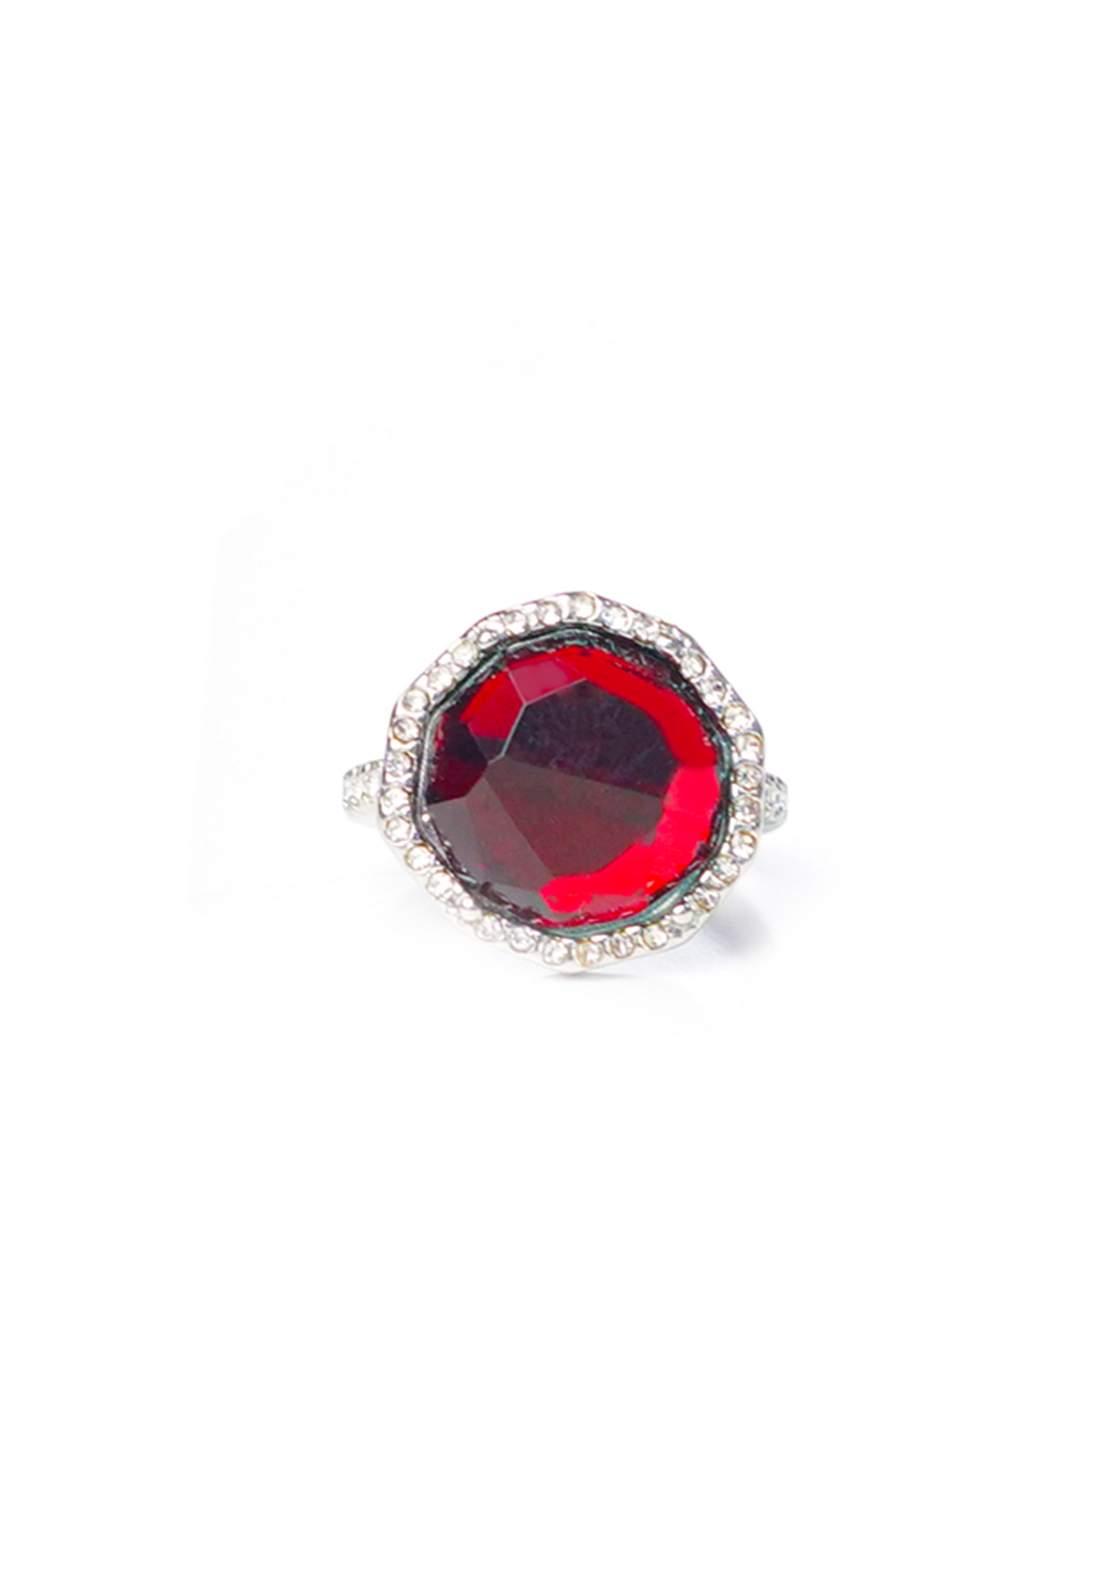 خاتم نسائي فضي بحجر احمر اللون